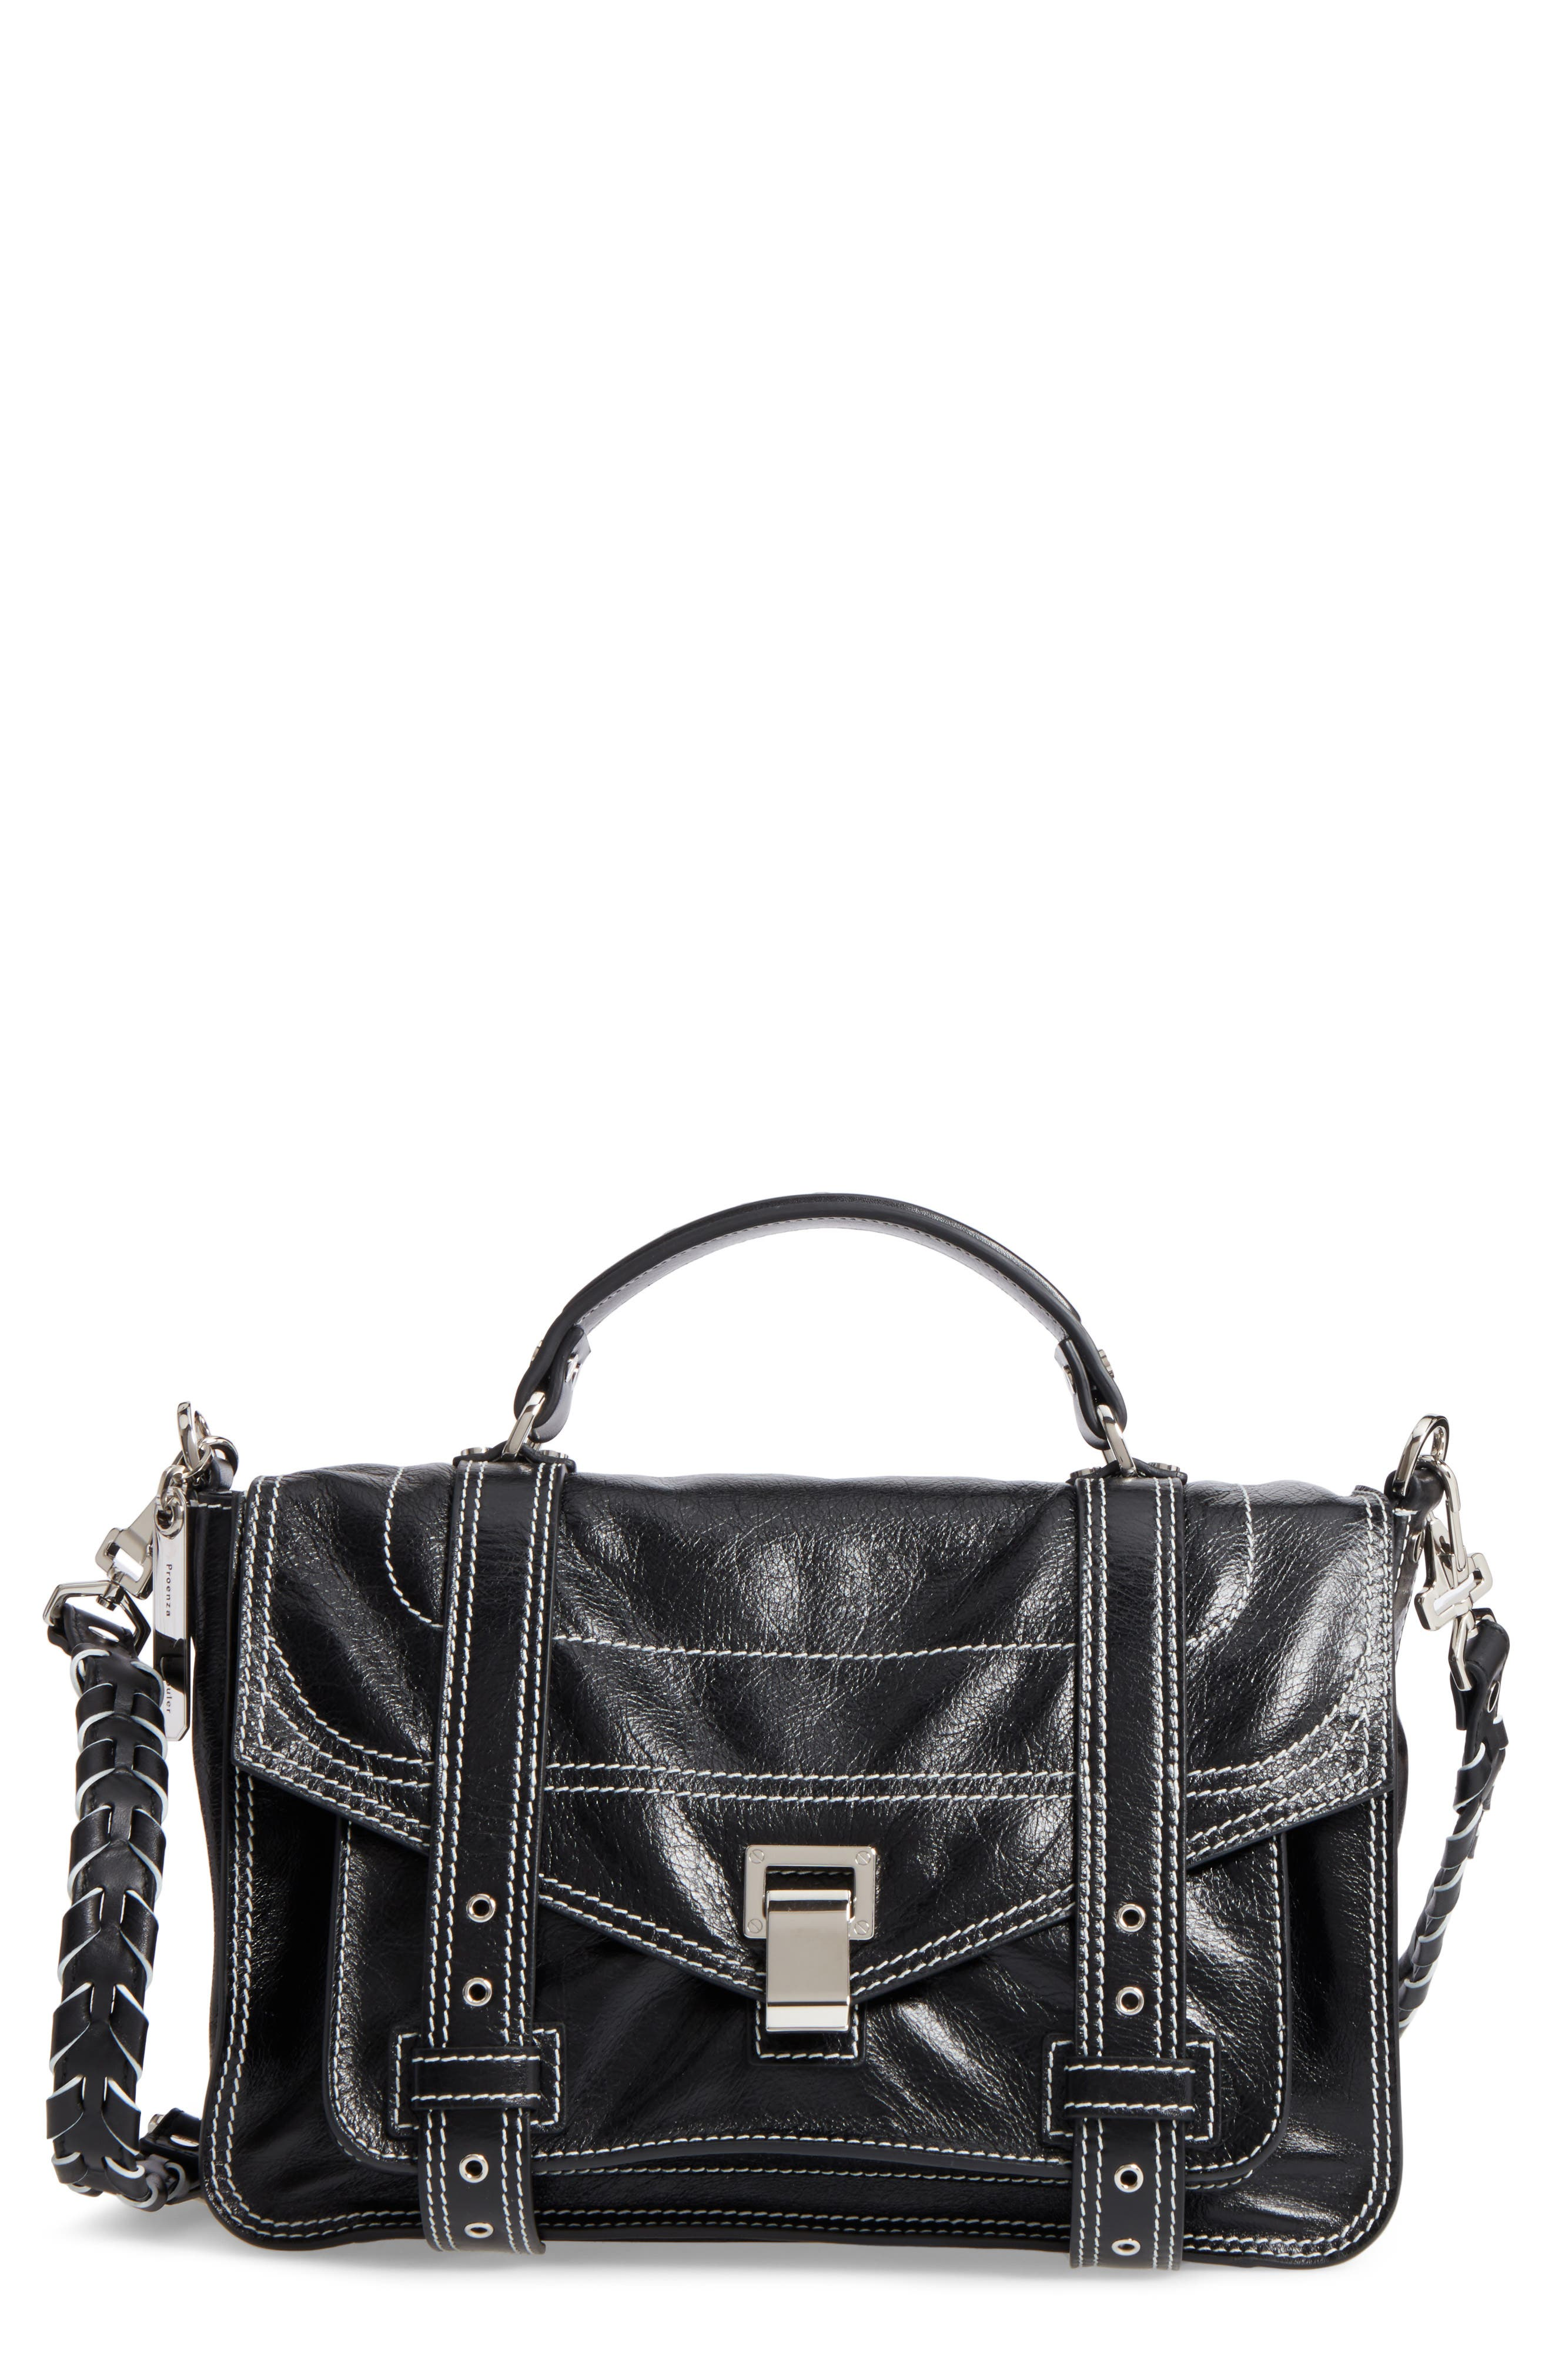 Proenza Schouler Medium PS1 Calfskin Leather Satchel